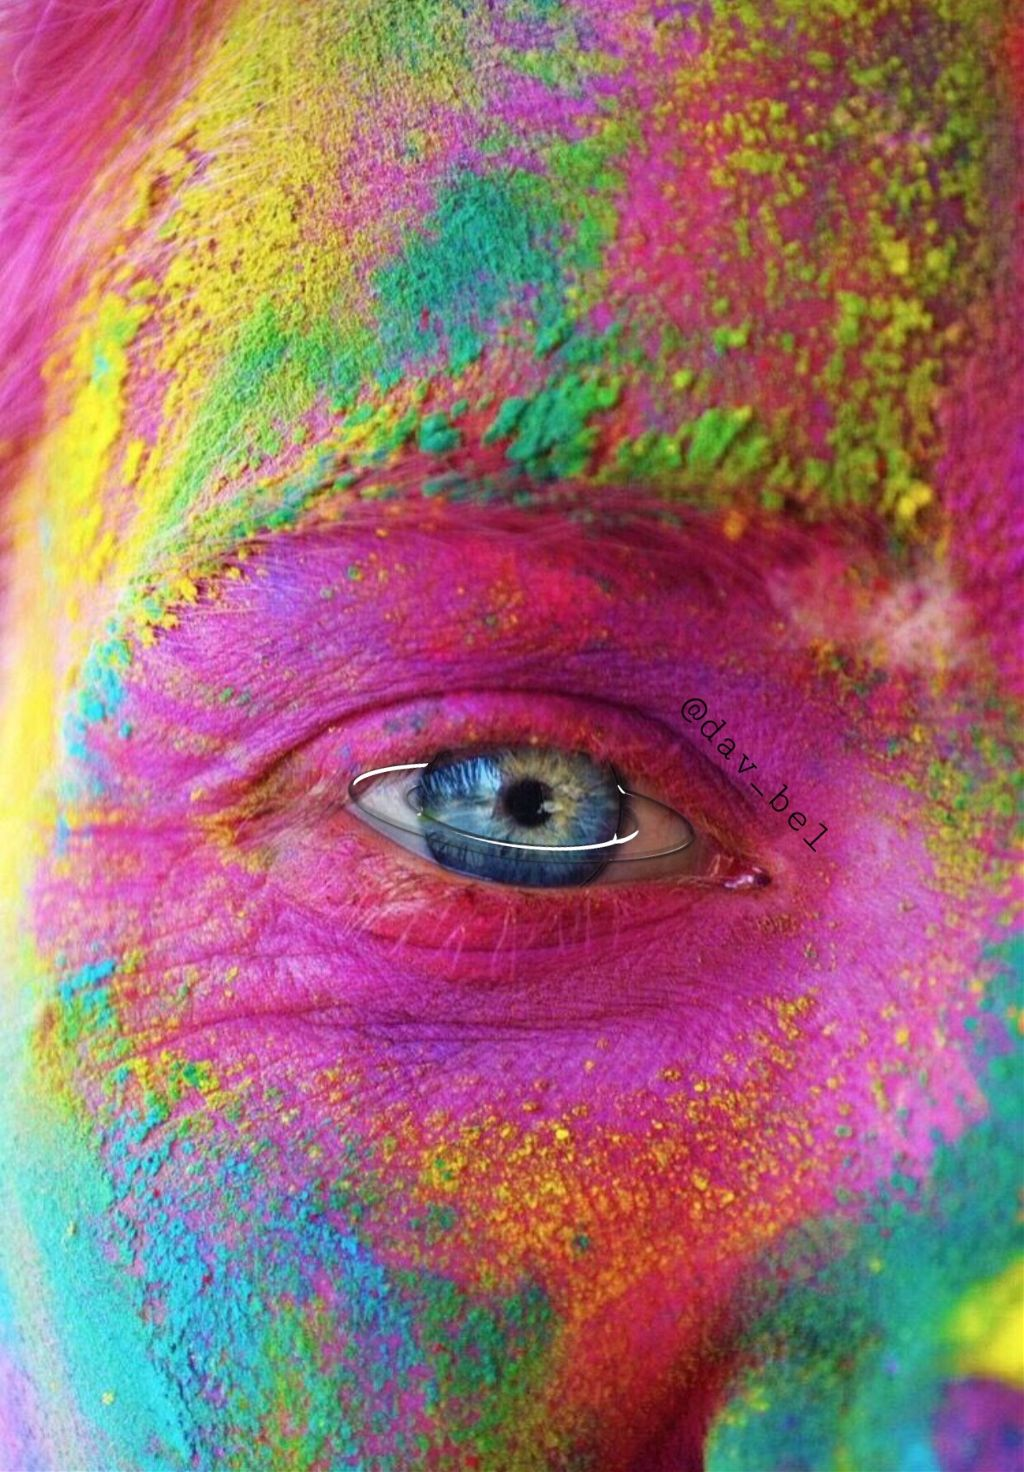 #freetoedit #holi #holirun #dust #powder #color #colors #rainbow #boy #eye #saturn #saturneye #eyes #blueeye #face #makeup #interesting #party #people #summer